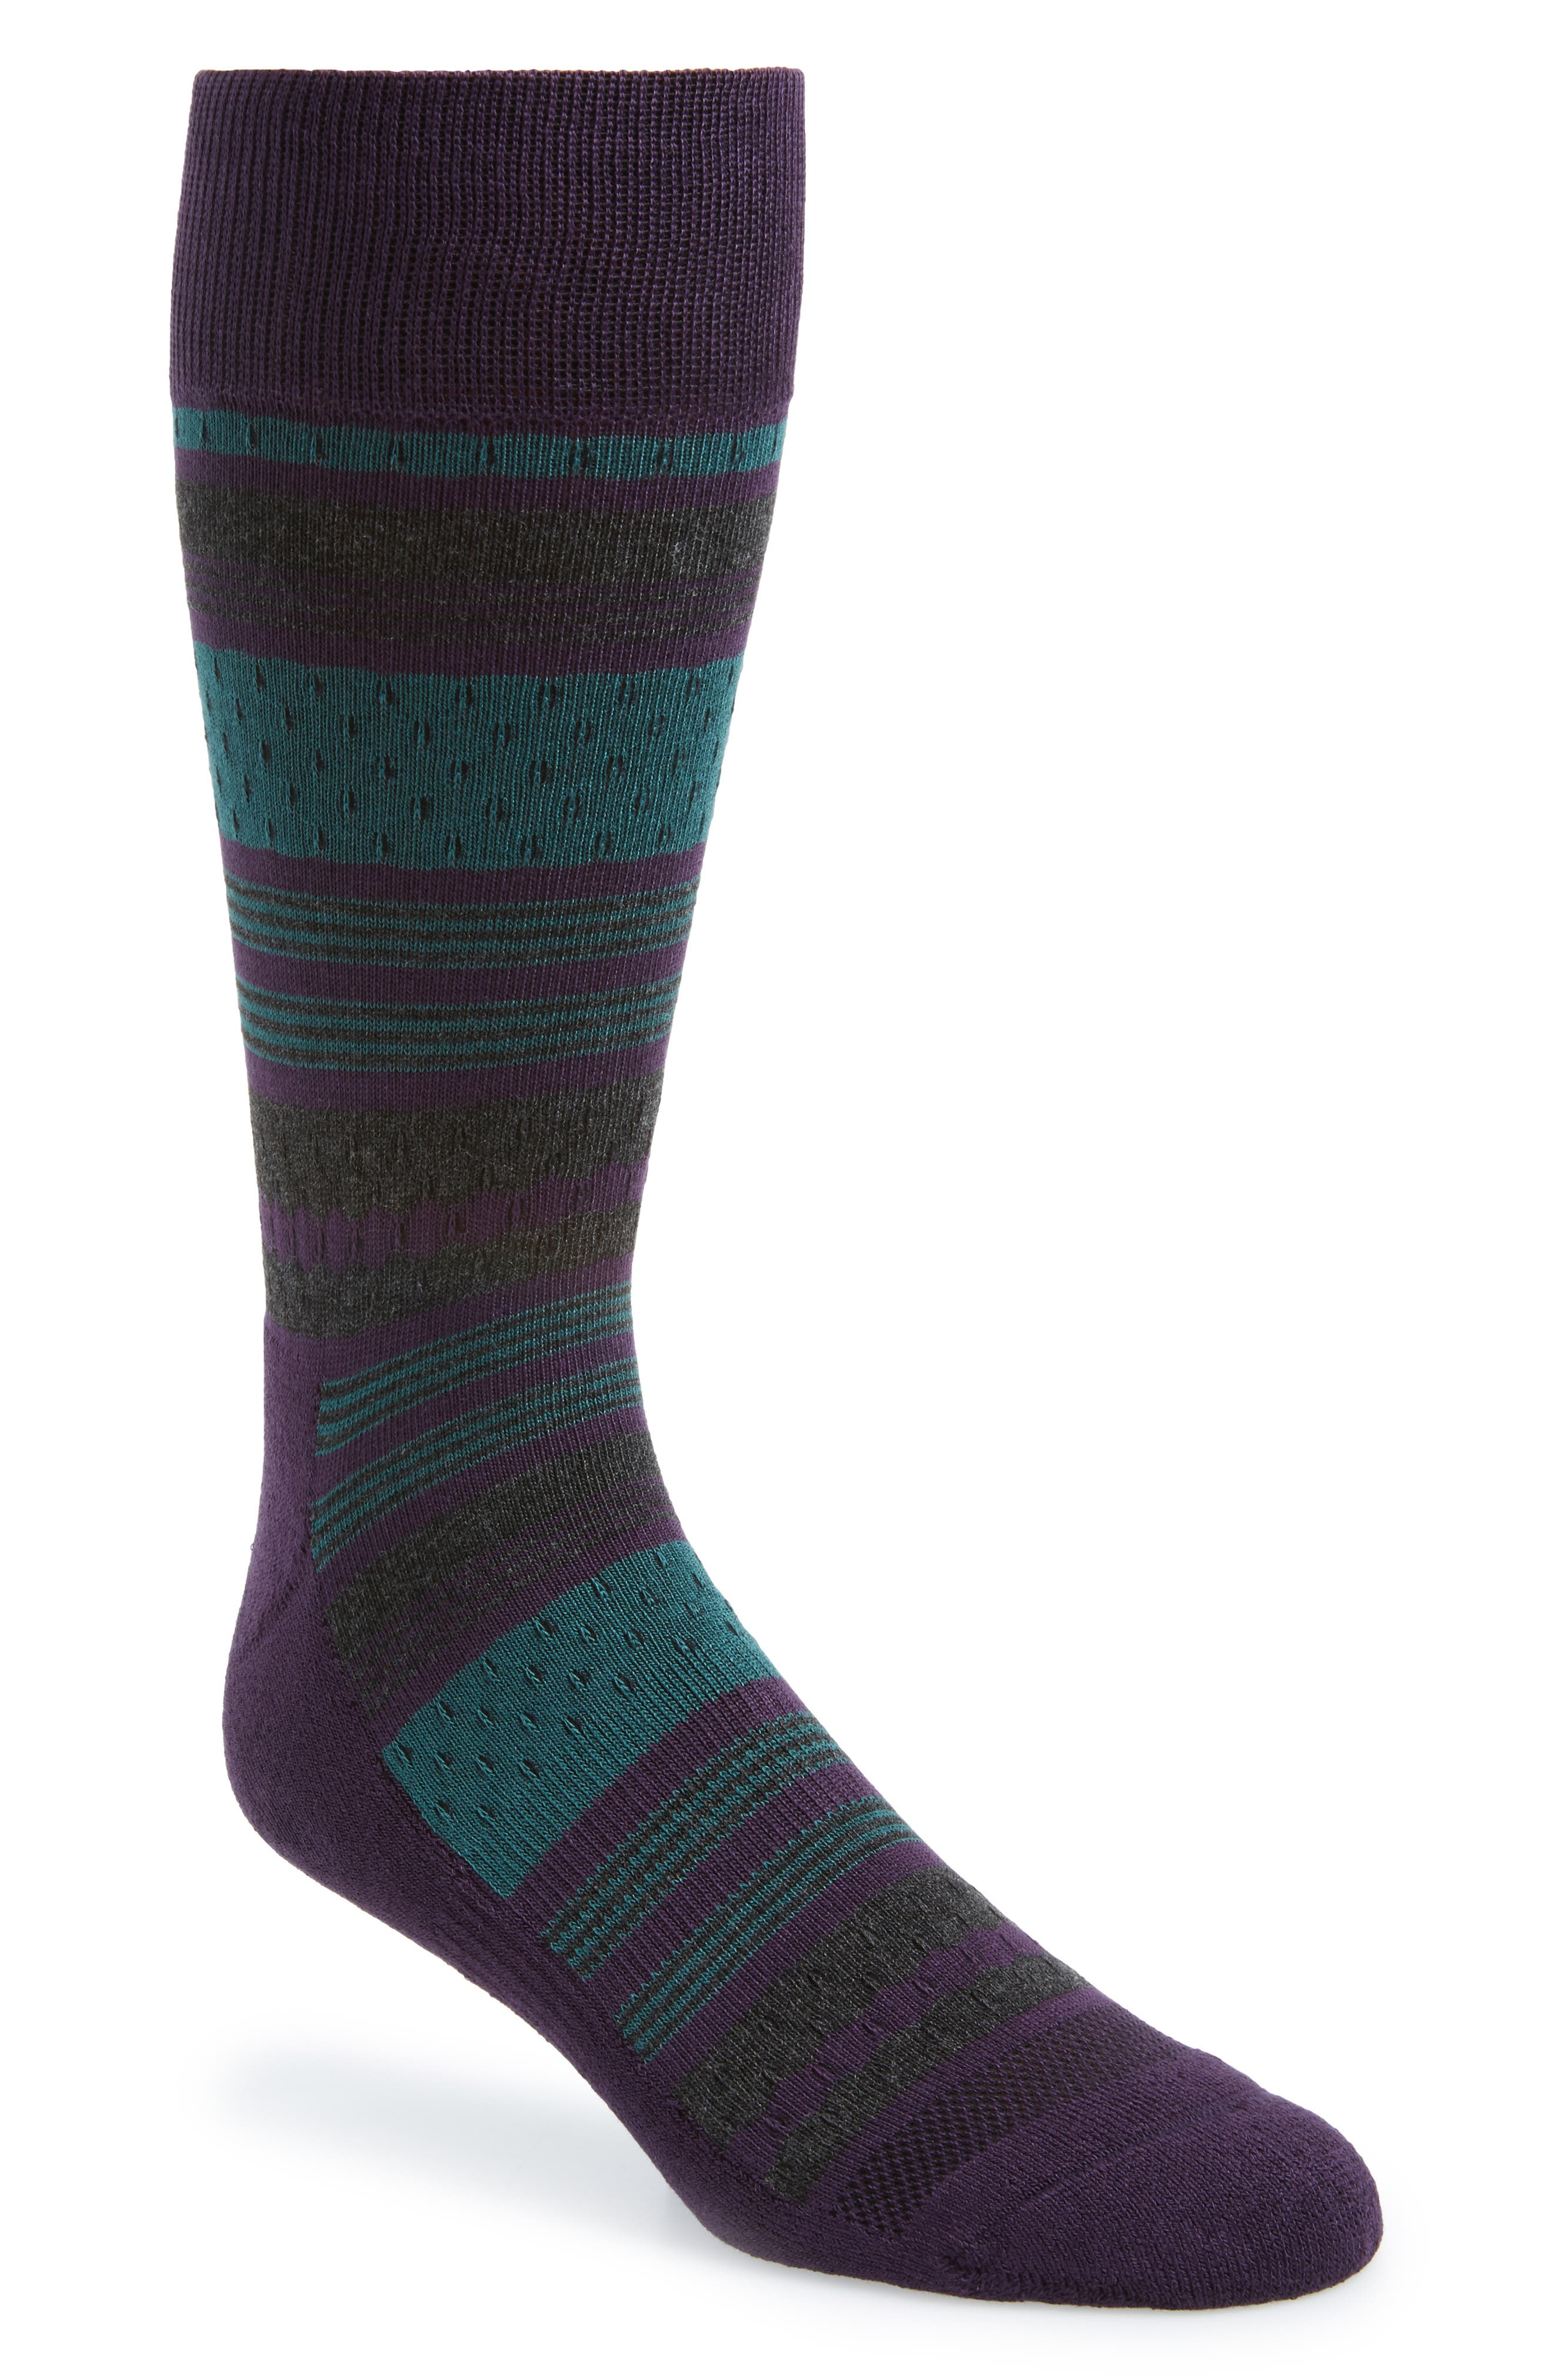 Stripe Socks,                             Main thumbnail 1, color,                             PURPLE/ CHARCOAL